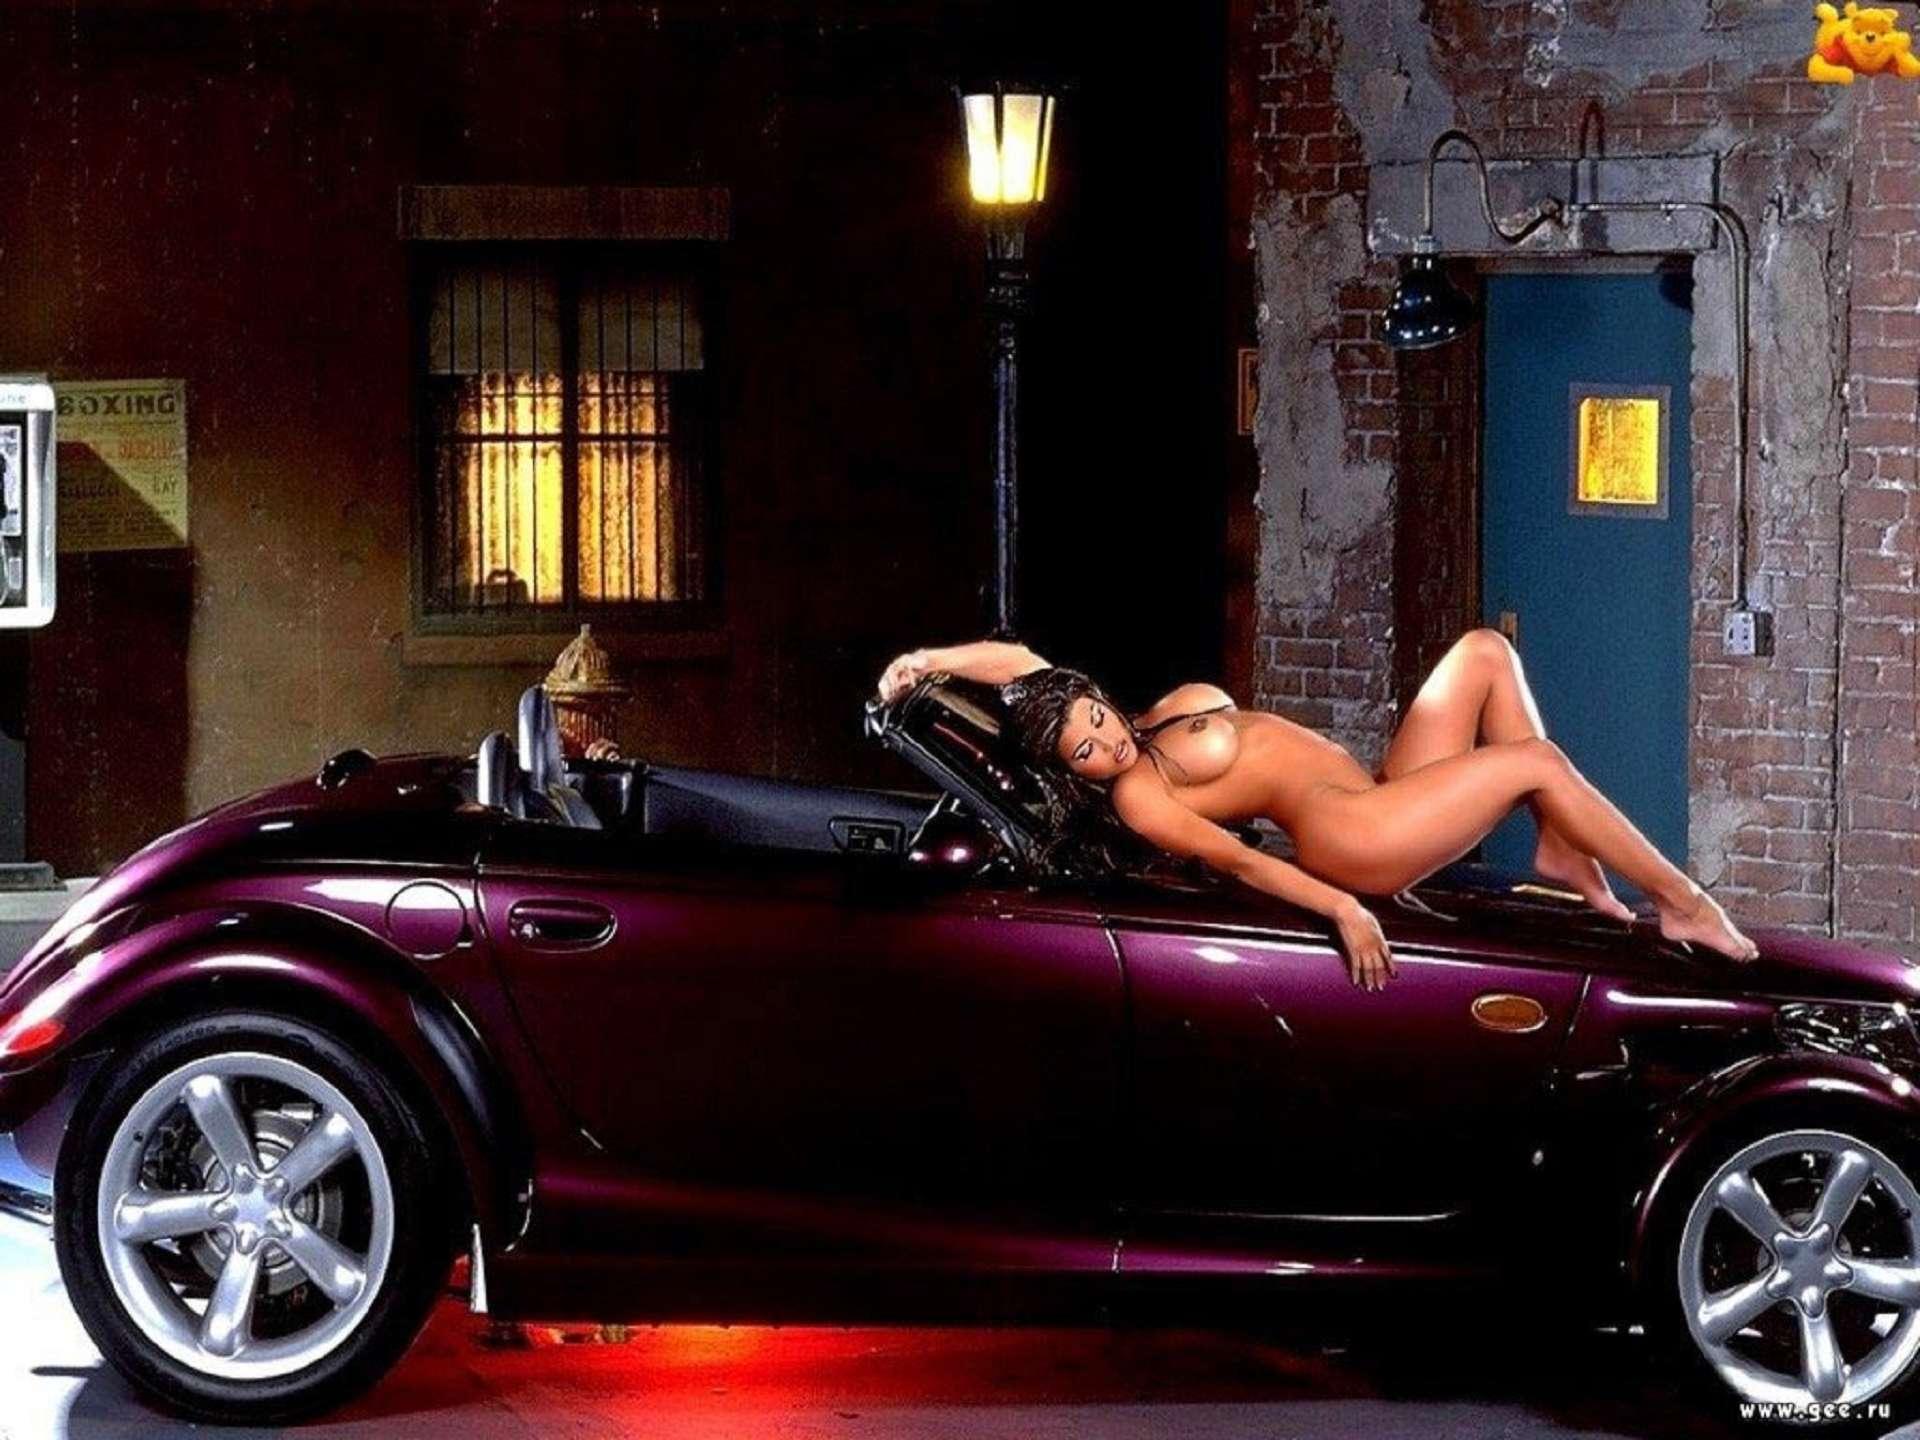 Фото голой девушки на авто 16 фотография